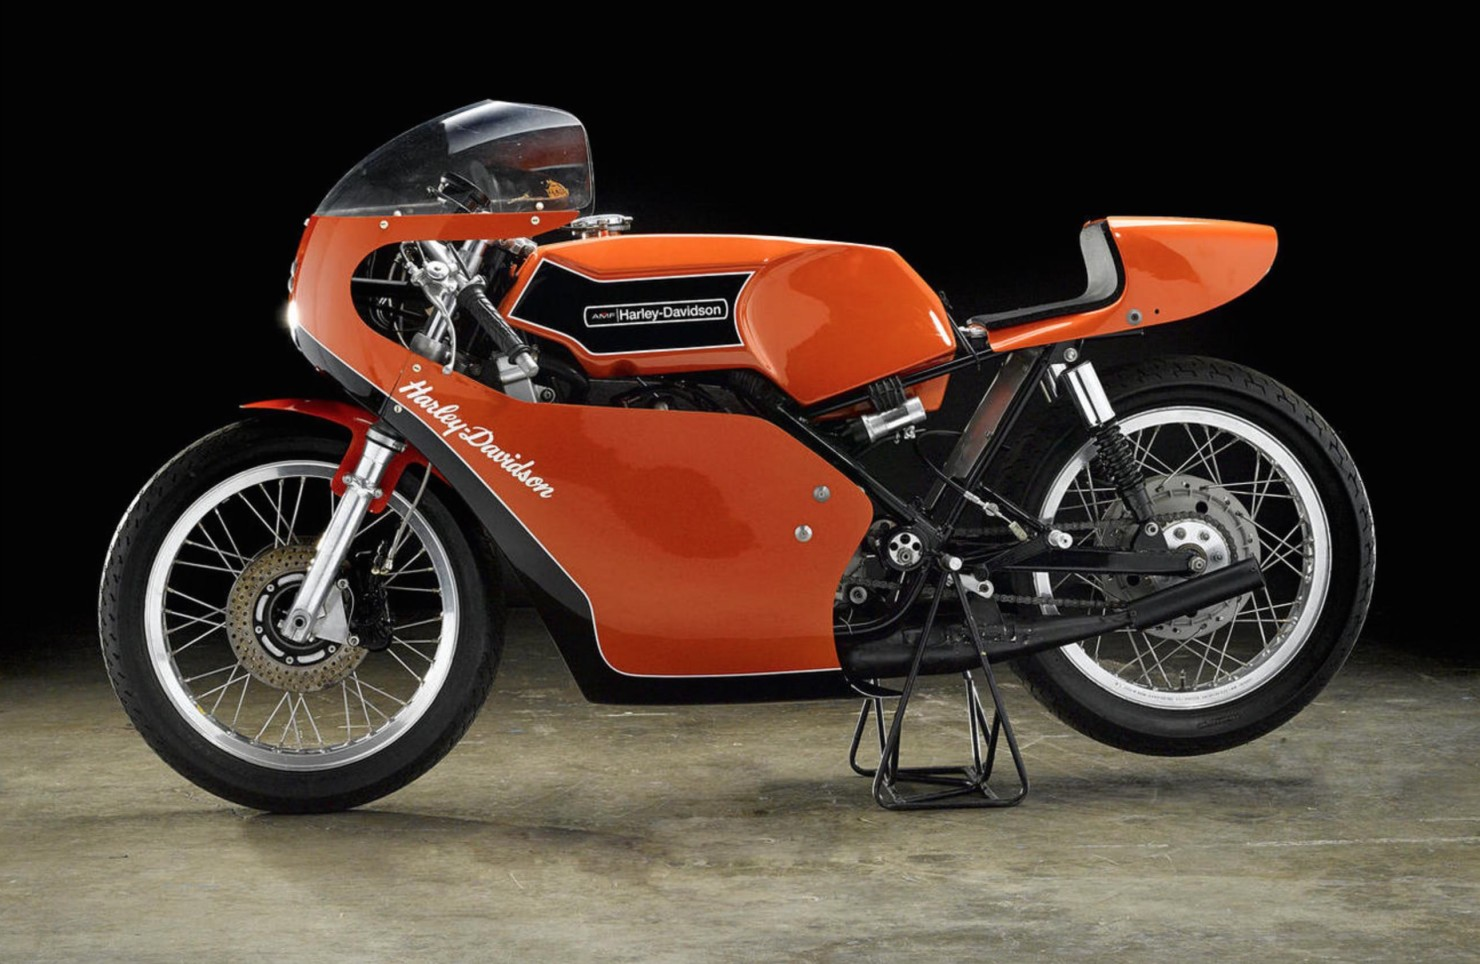 Harley-Davidson RR350 4